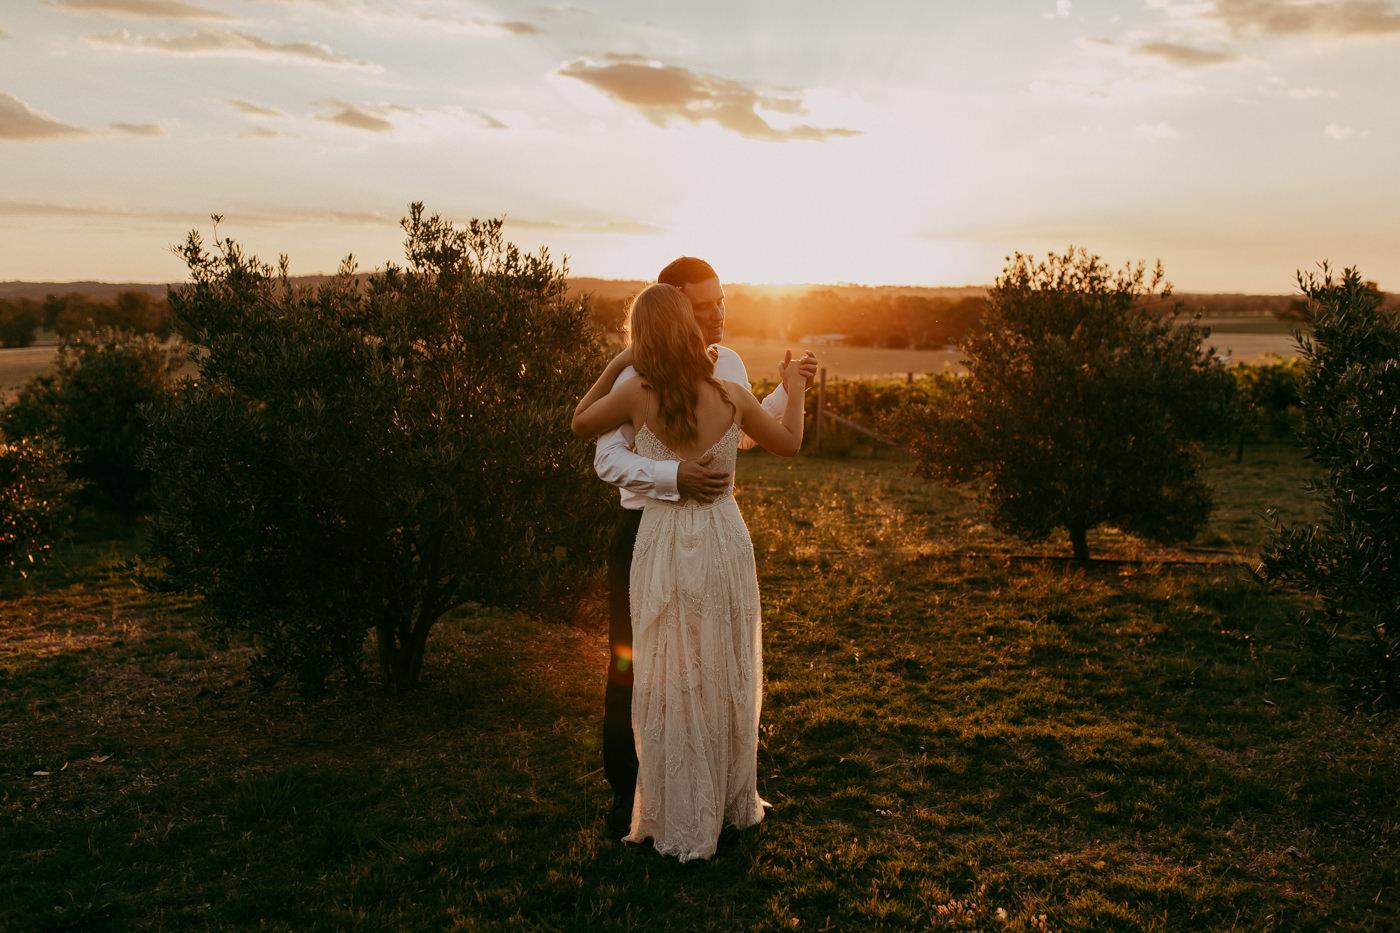 Anthony & Eliet - Wagga Wagga Wedding - Country NSW - Samantha Heather Photography-153.jpg